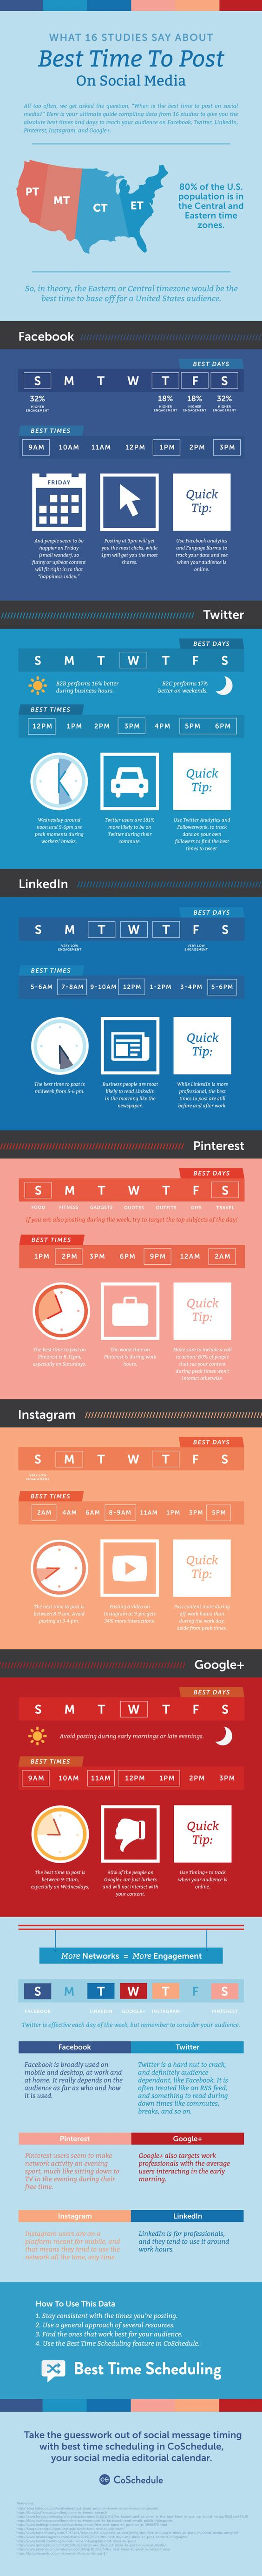 When Should I Post On Social Media?